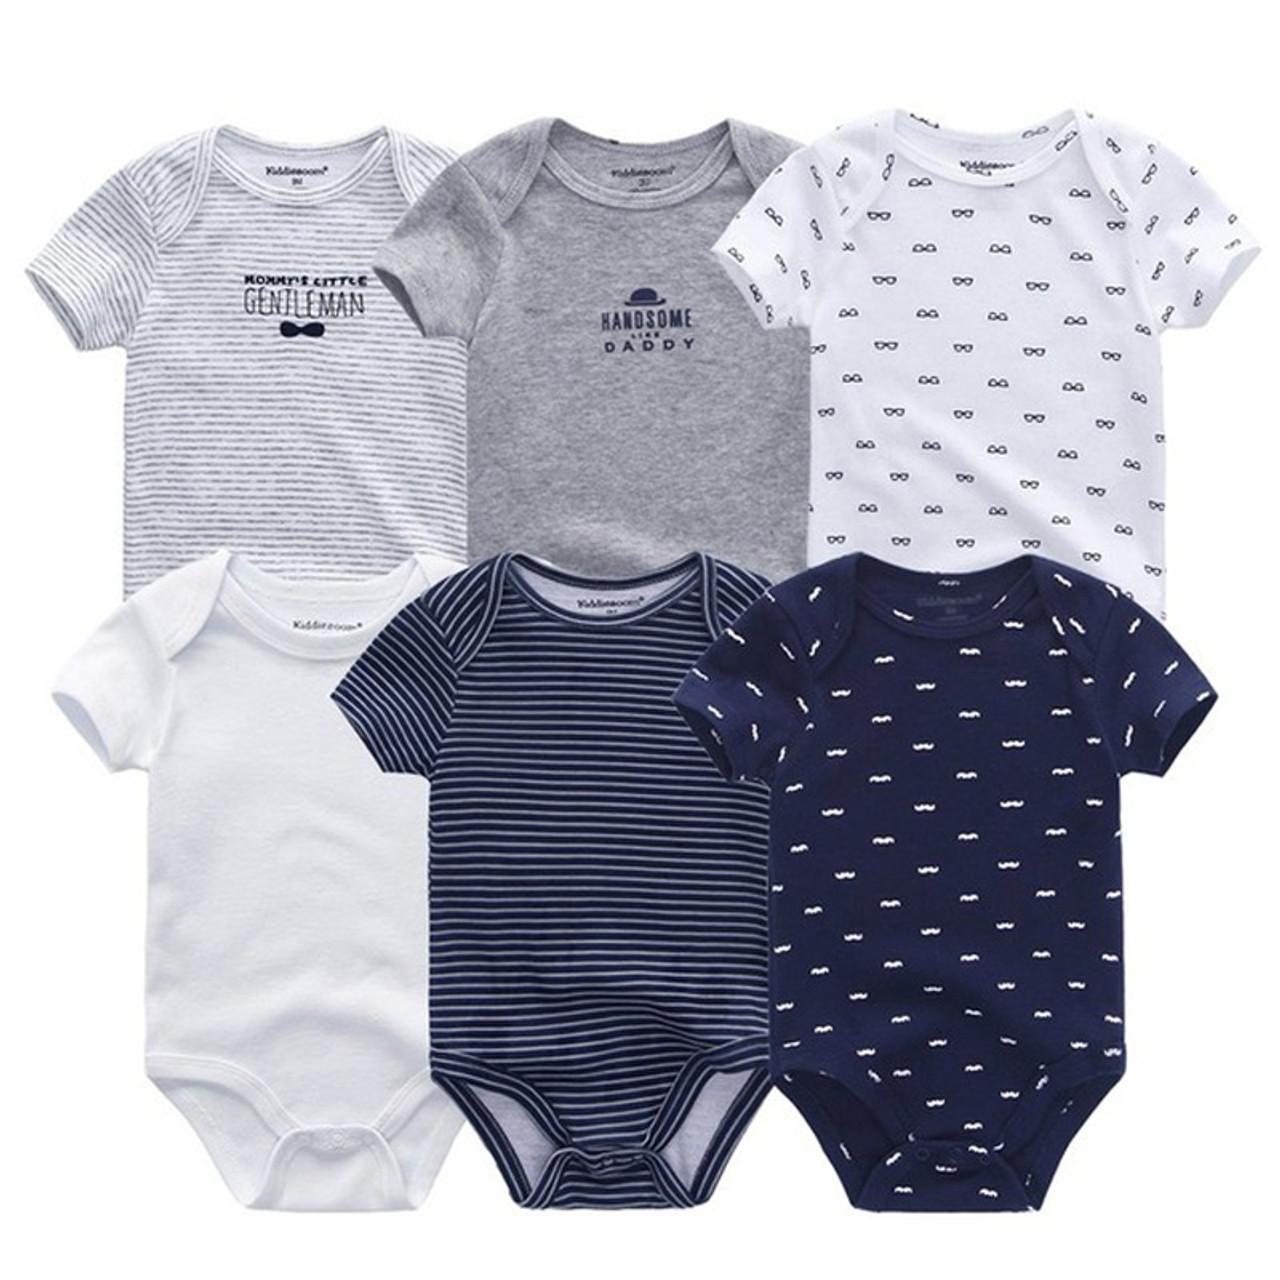 13e5990933ba8 6 PCS/lot newborn baby bodysuits short sleevele baby clothes O-neck 0-12M  baby Jumpsuit 100%Cotton baby clothing Infant sets - OnshopDeals.Com